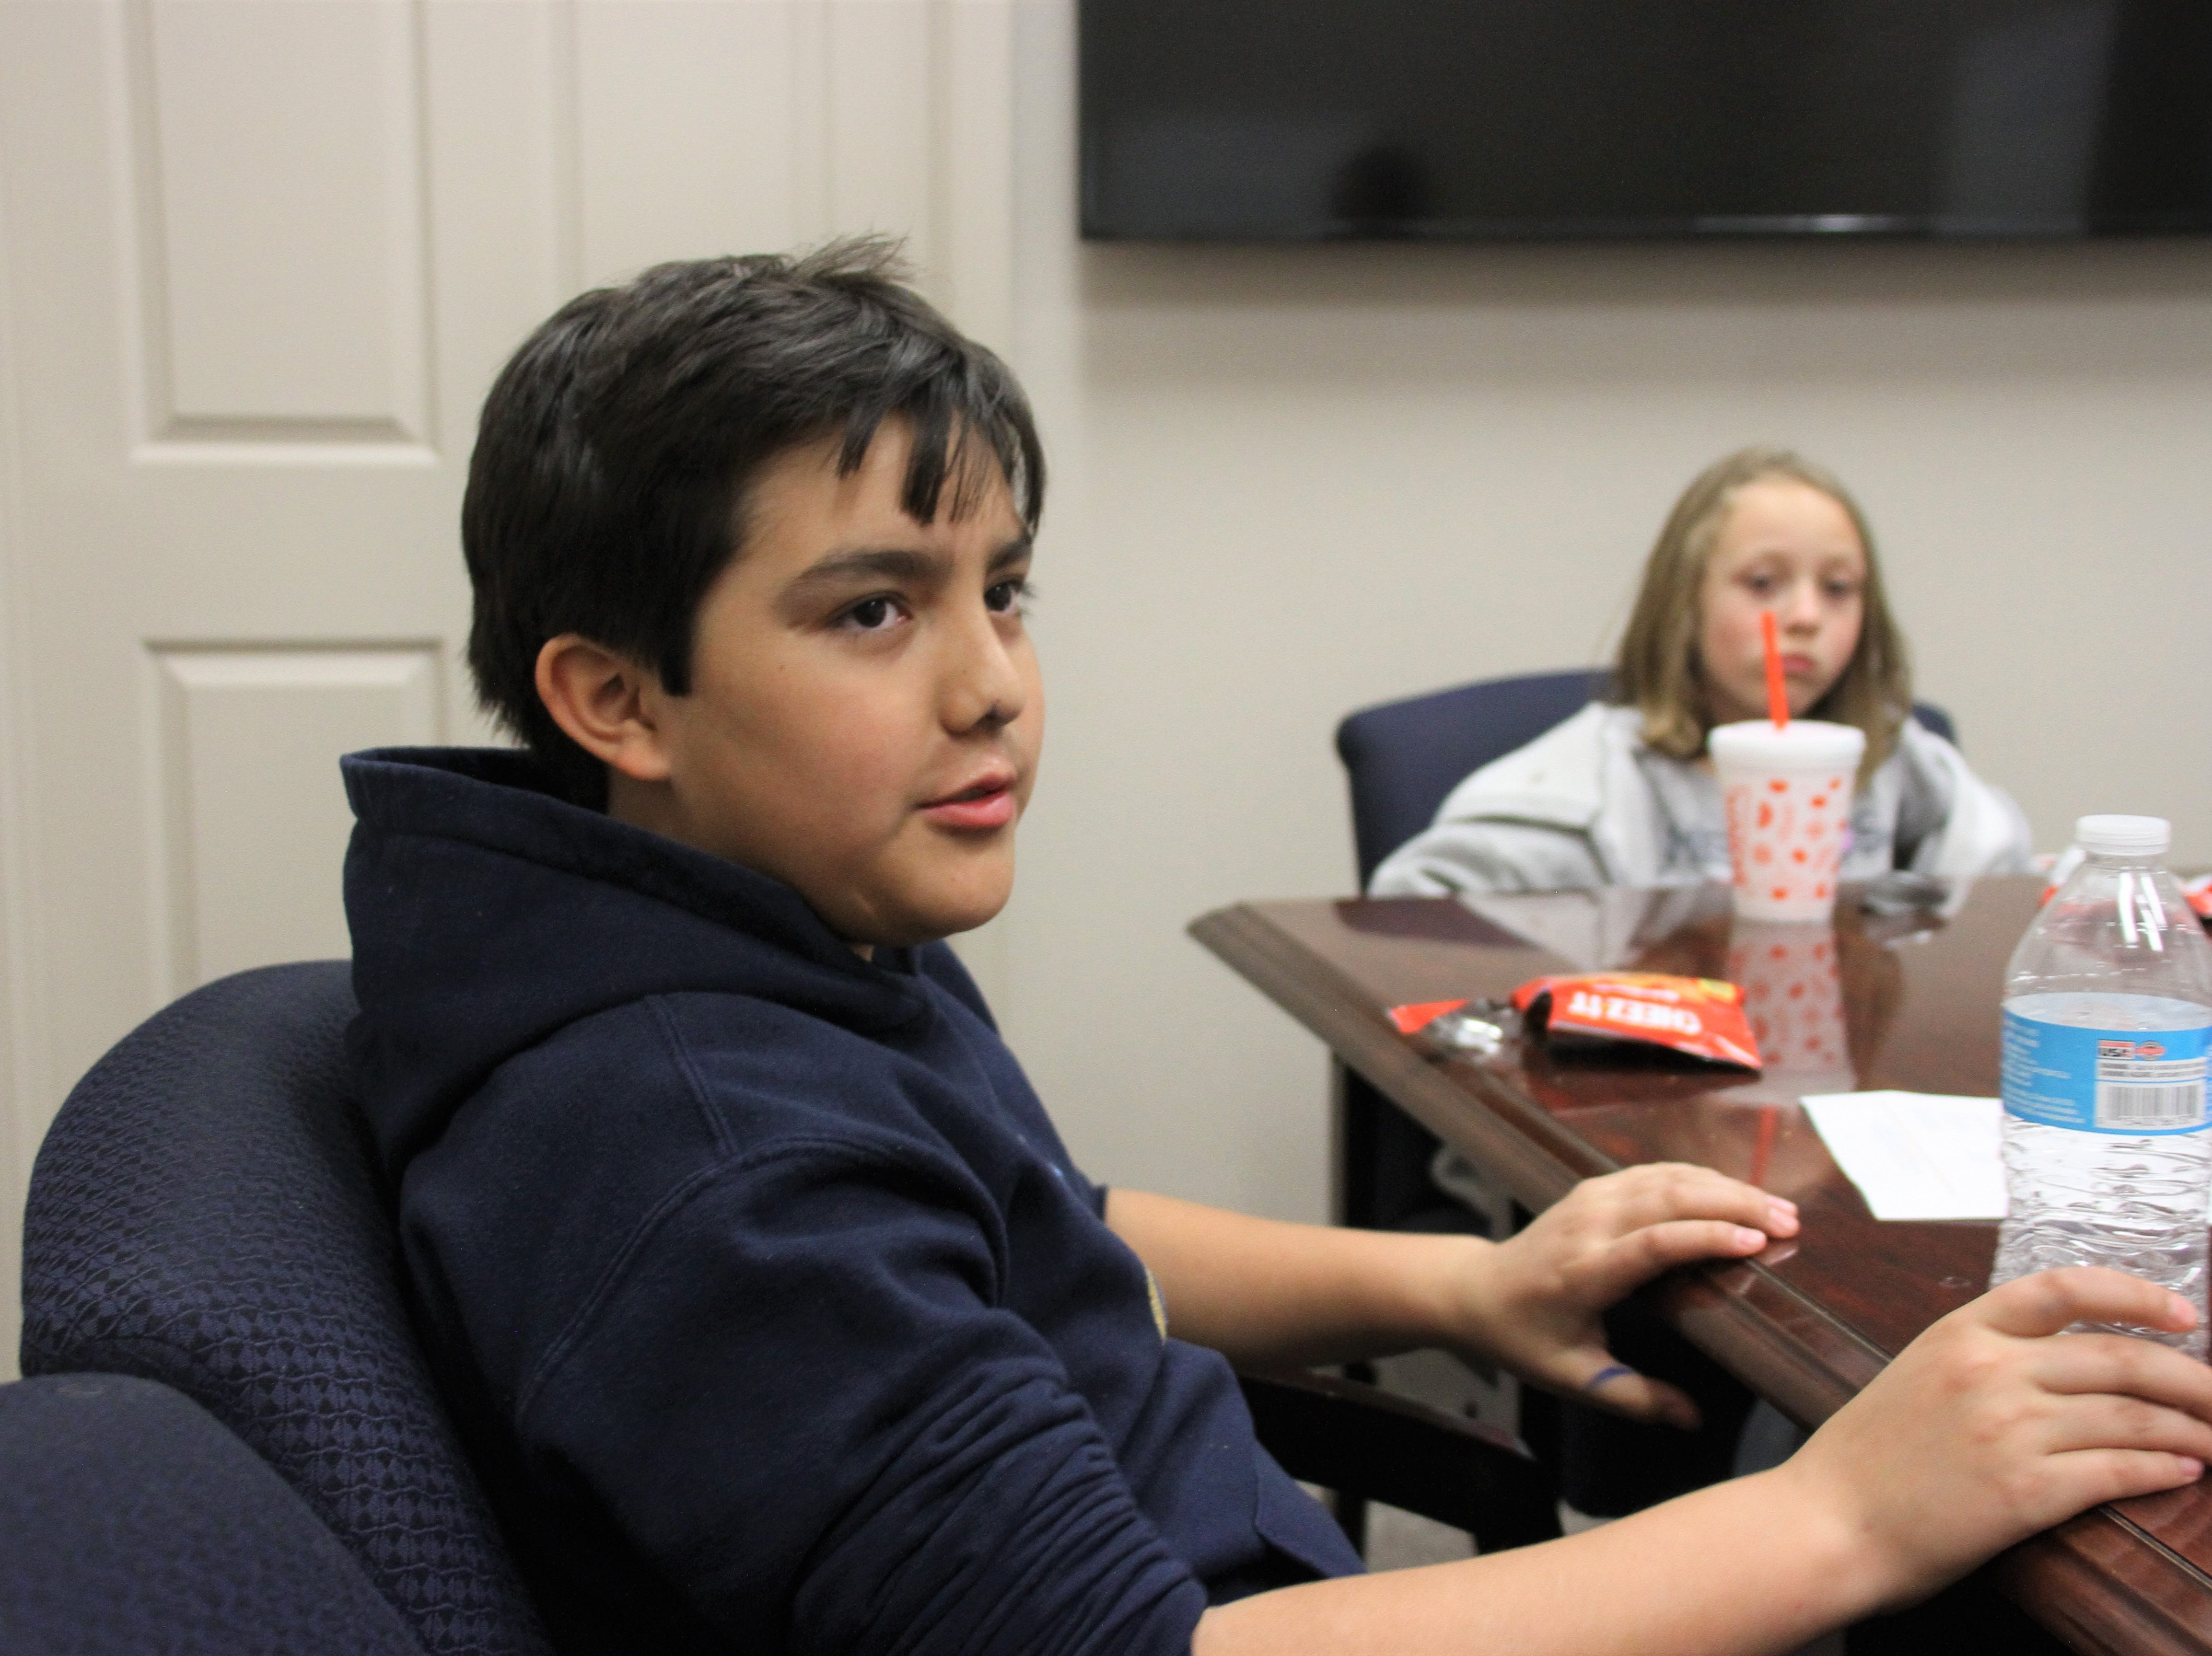 Jacob Mesta, 11, of Ruben S. Torres Elementary School.